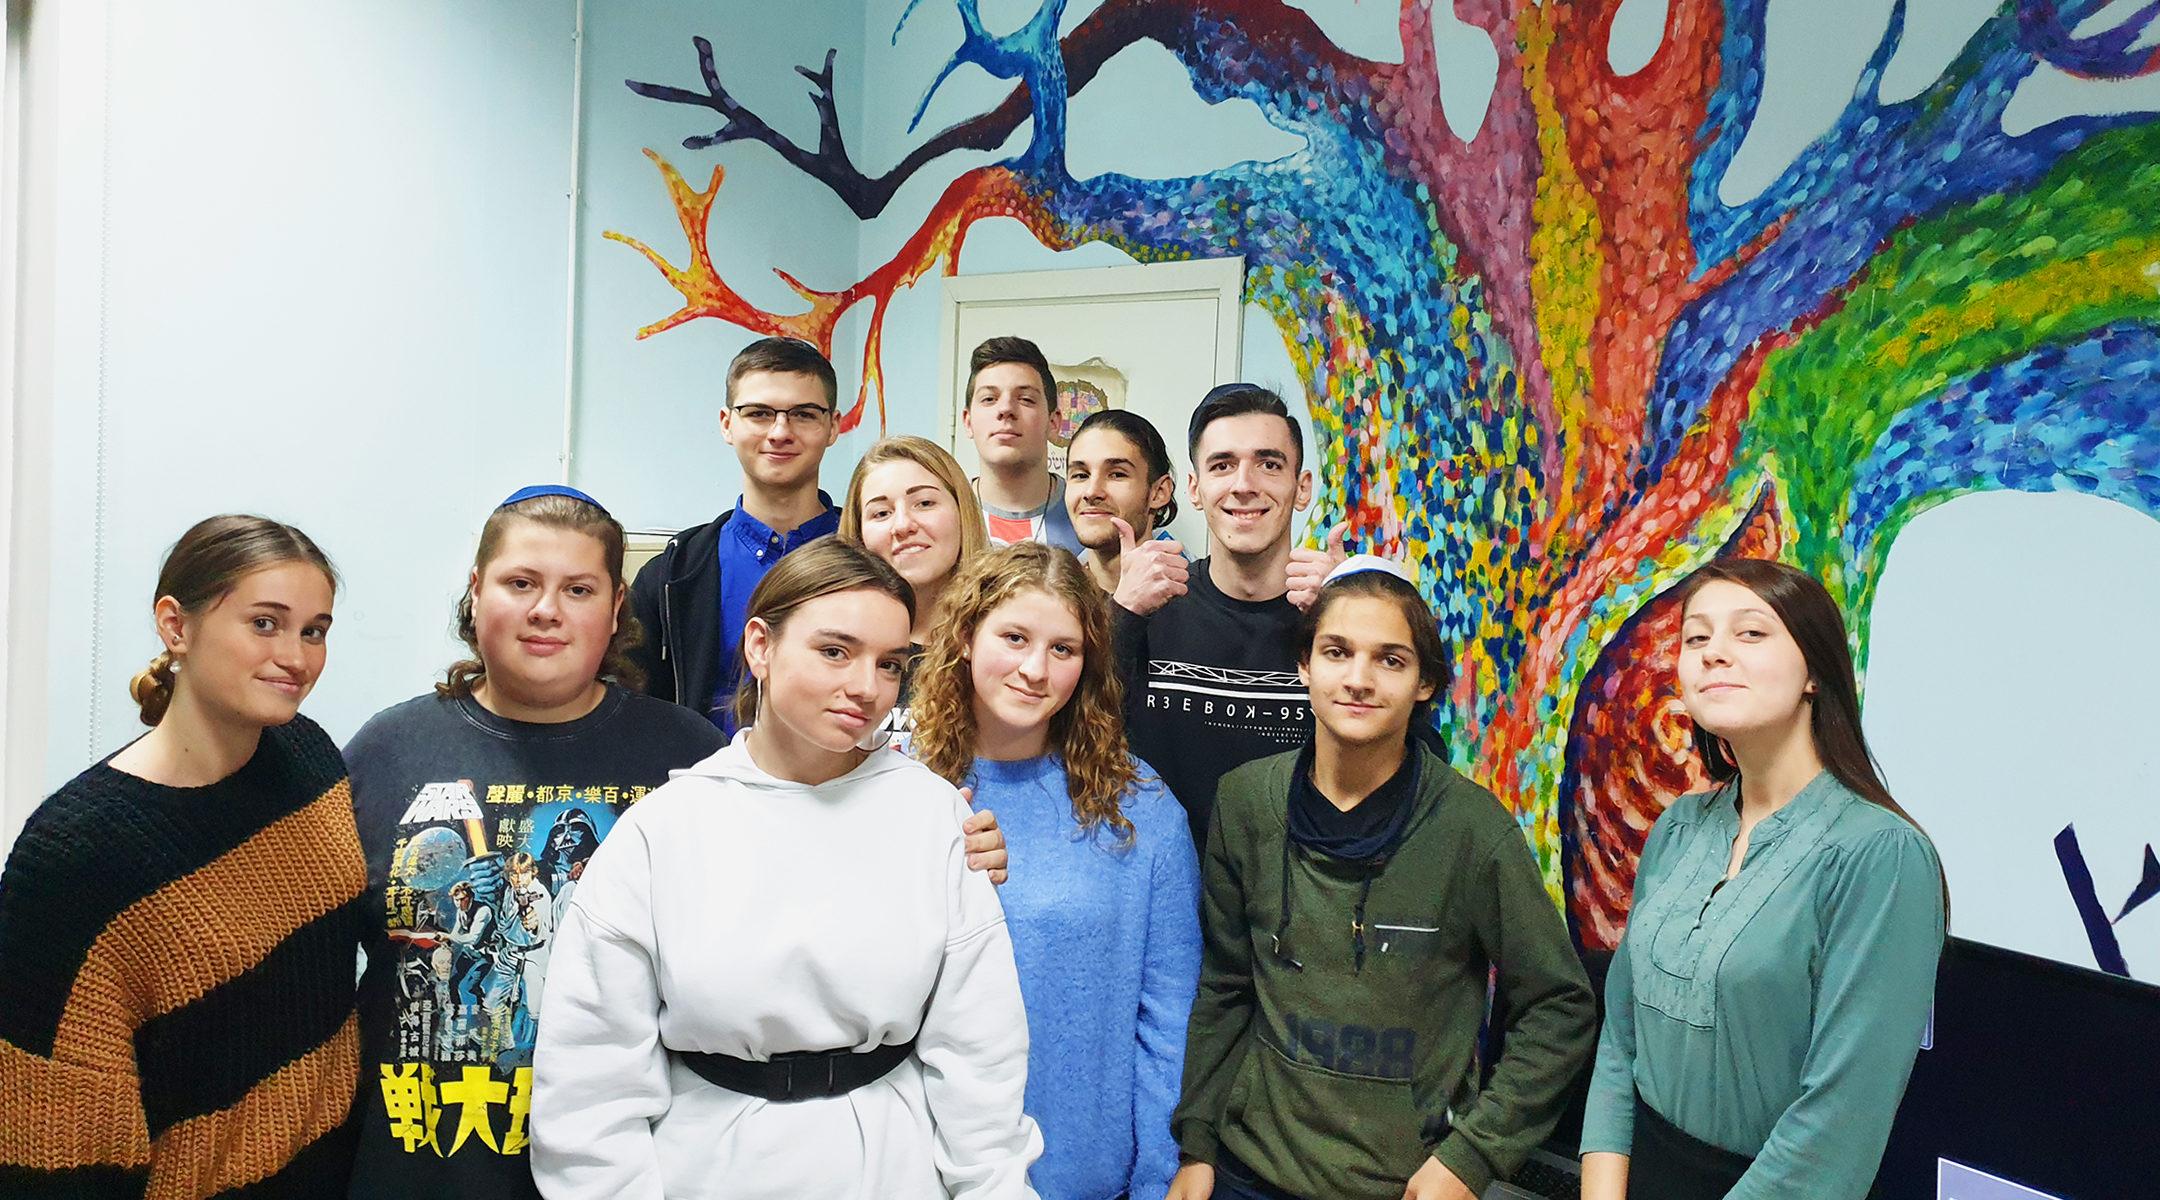 Ukrainian Jews at the Beit Grand Jewish Community Center in Odessa on Nov. 1, 2019. (Cnaan Liphshiz)